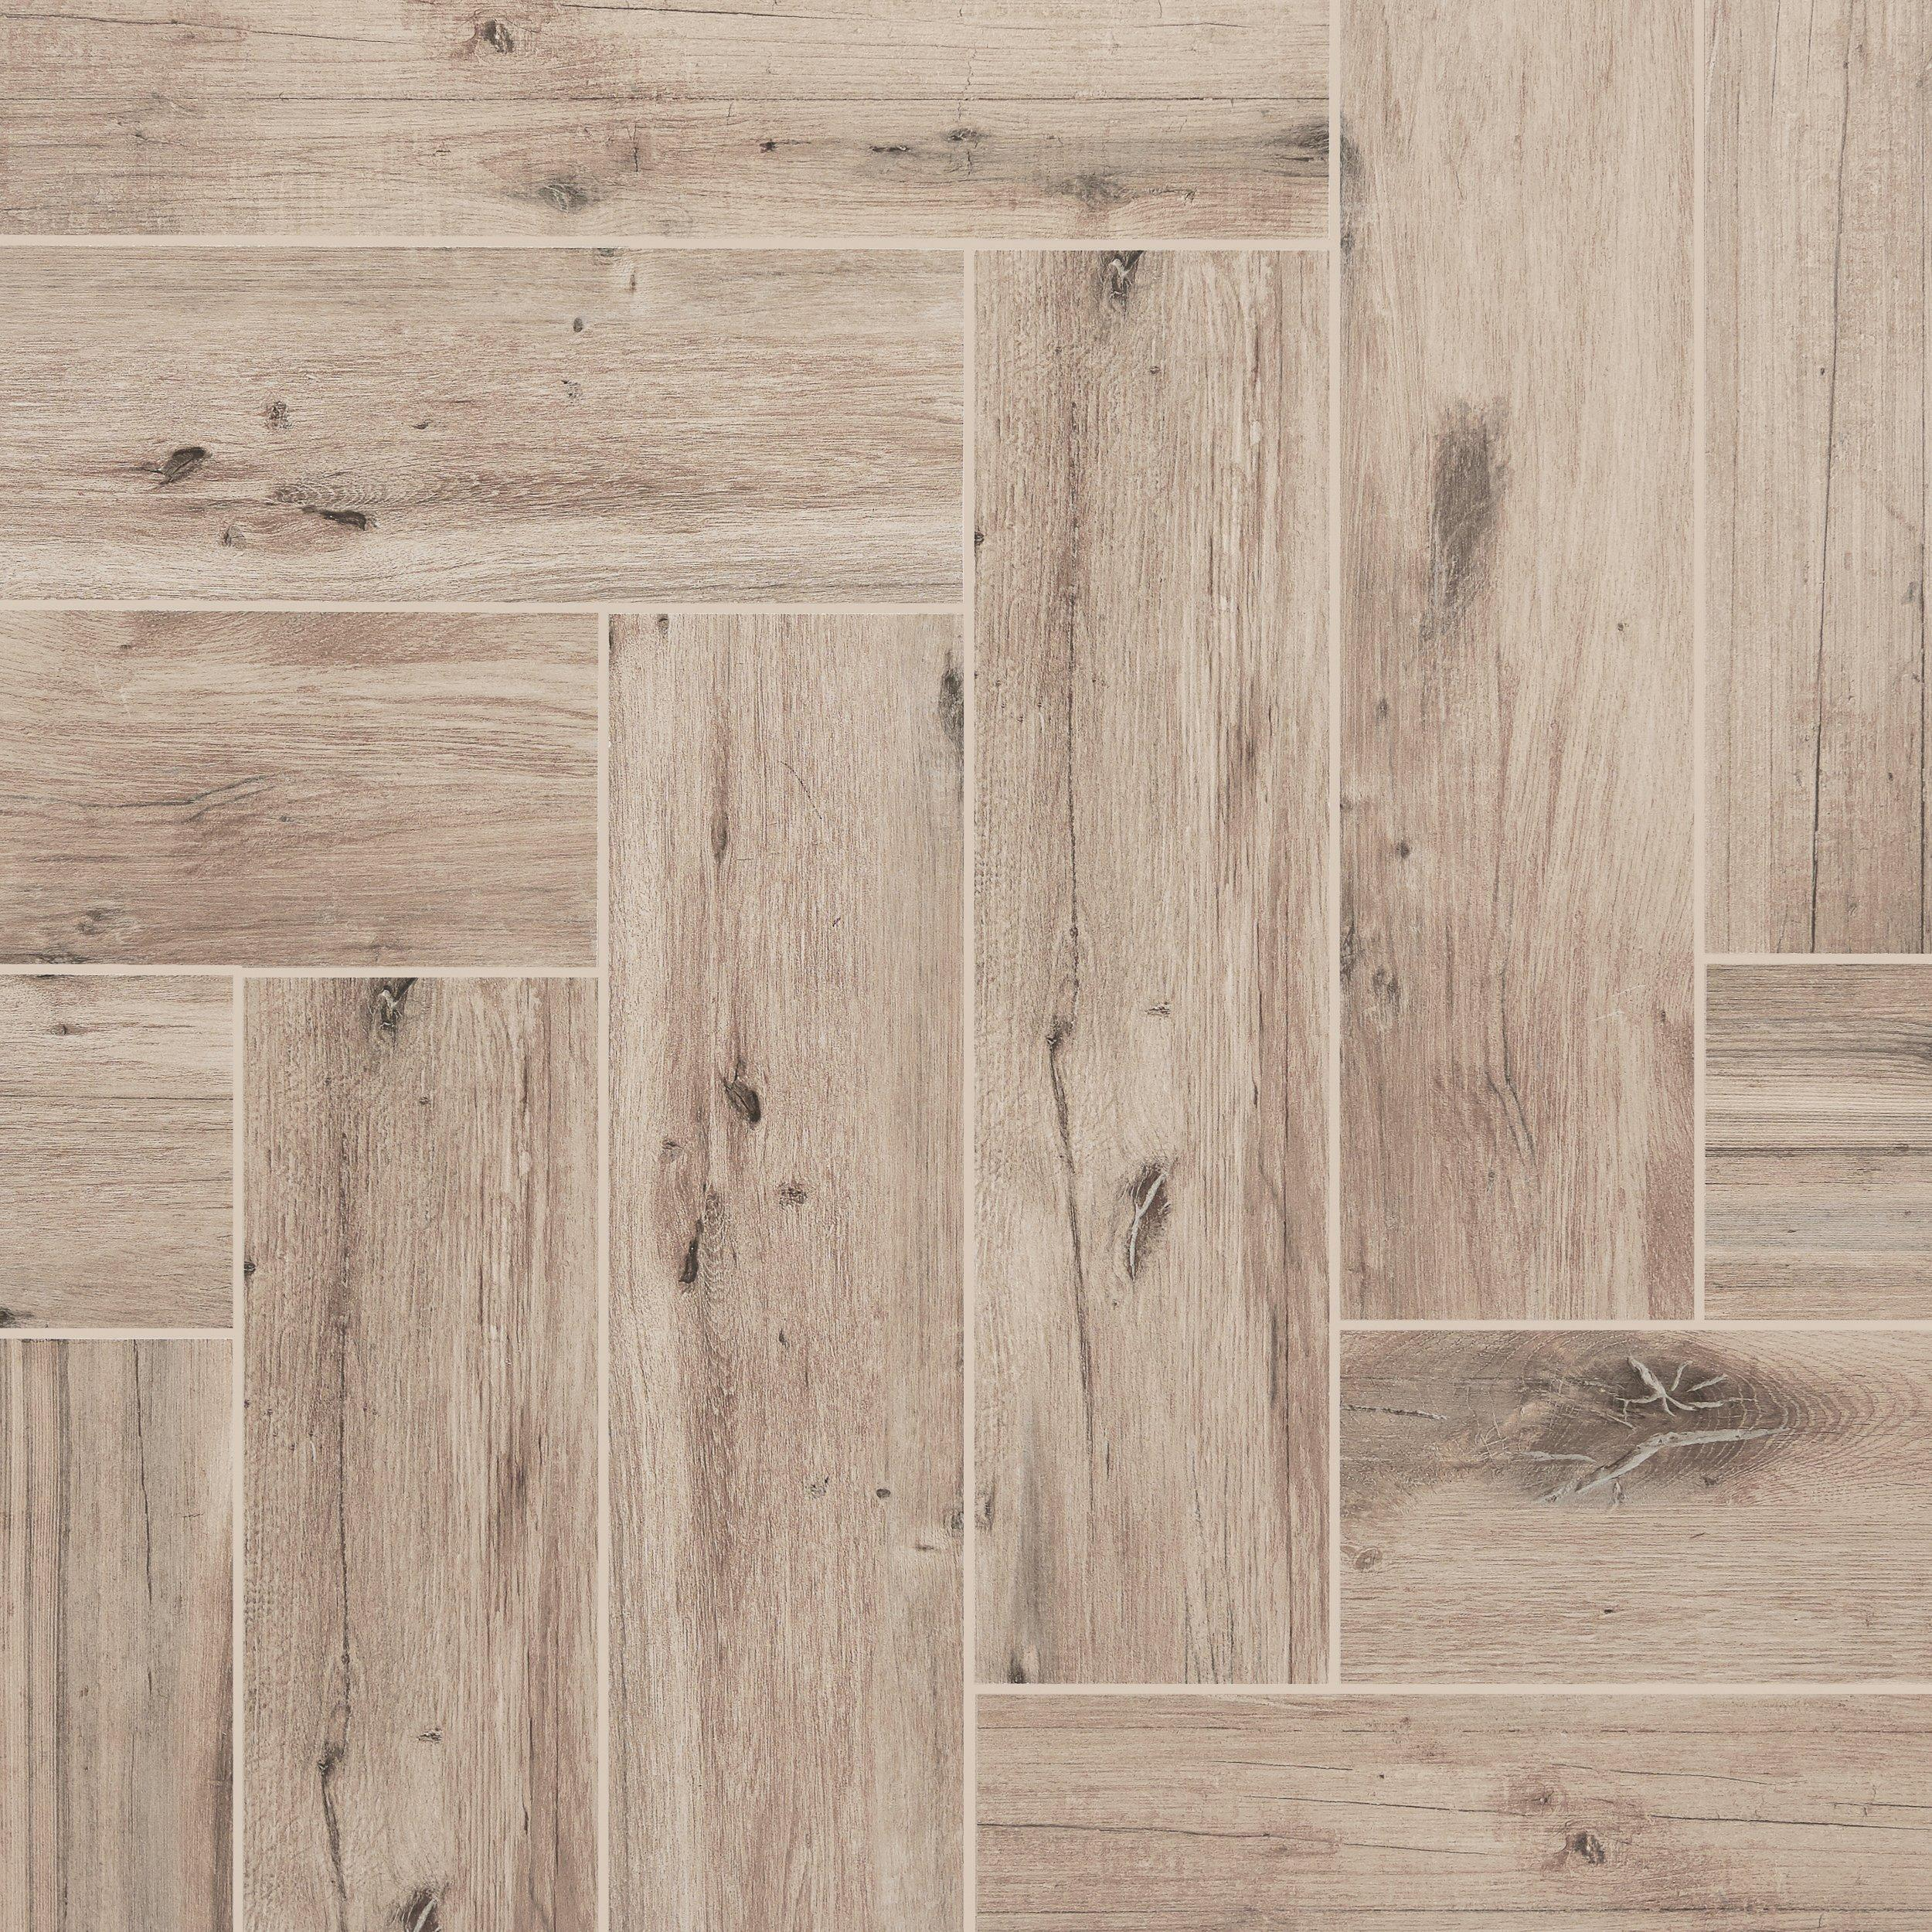 Mansfield Amber Wood Plank Porcelain Tile 6 x 24 100156603